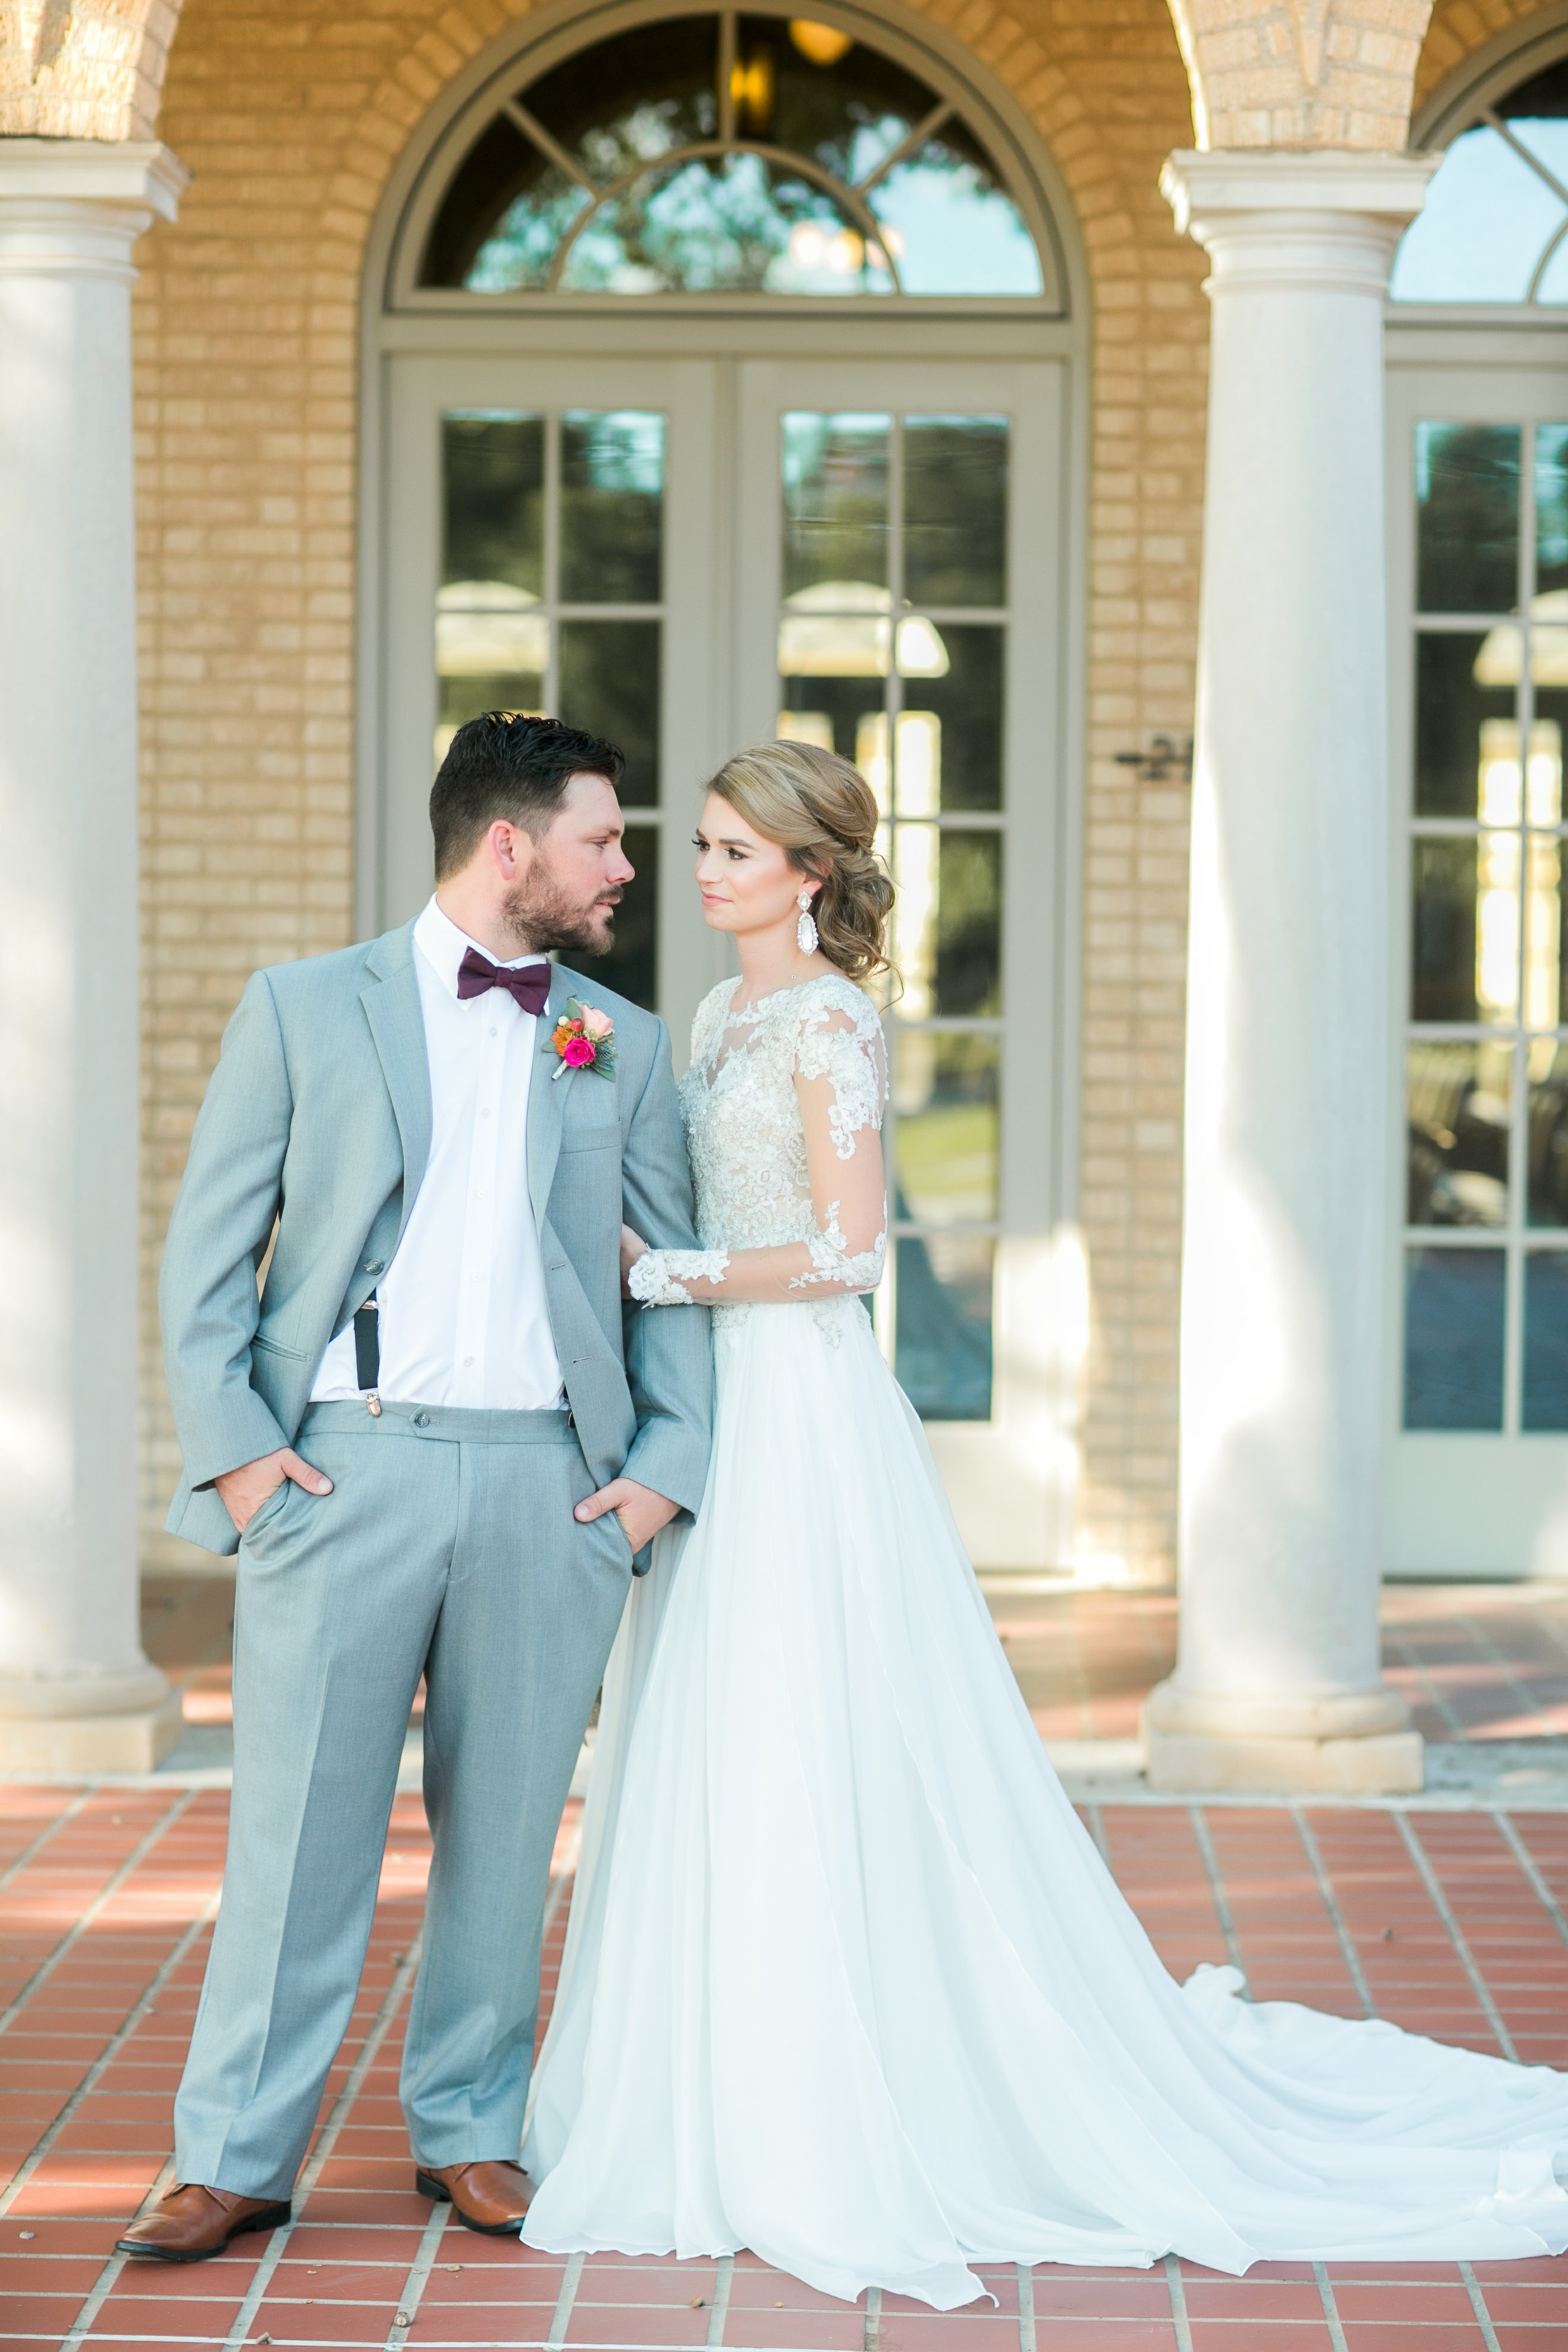 Roberson-Wedding-The-Forum-Lauren-Pinson-Wedding-Photography-Wichita-Falls-Texas-033.jpg